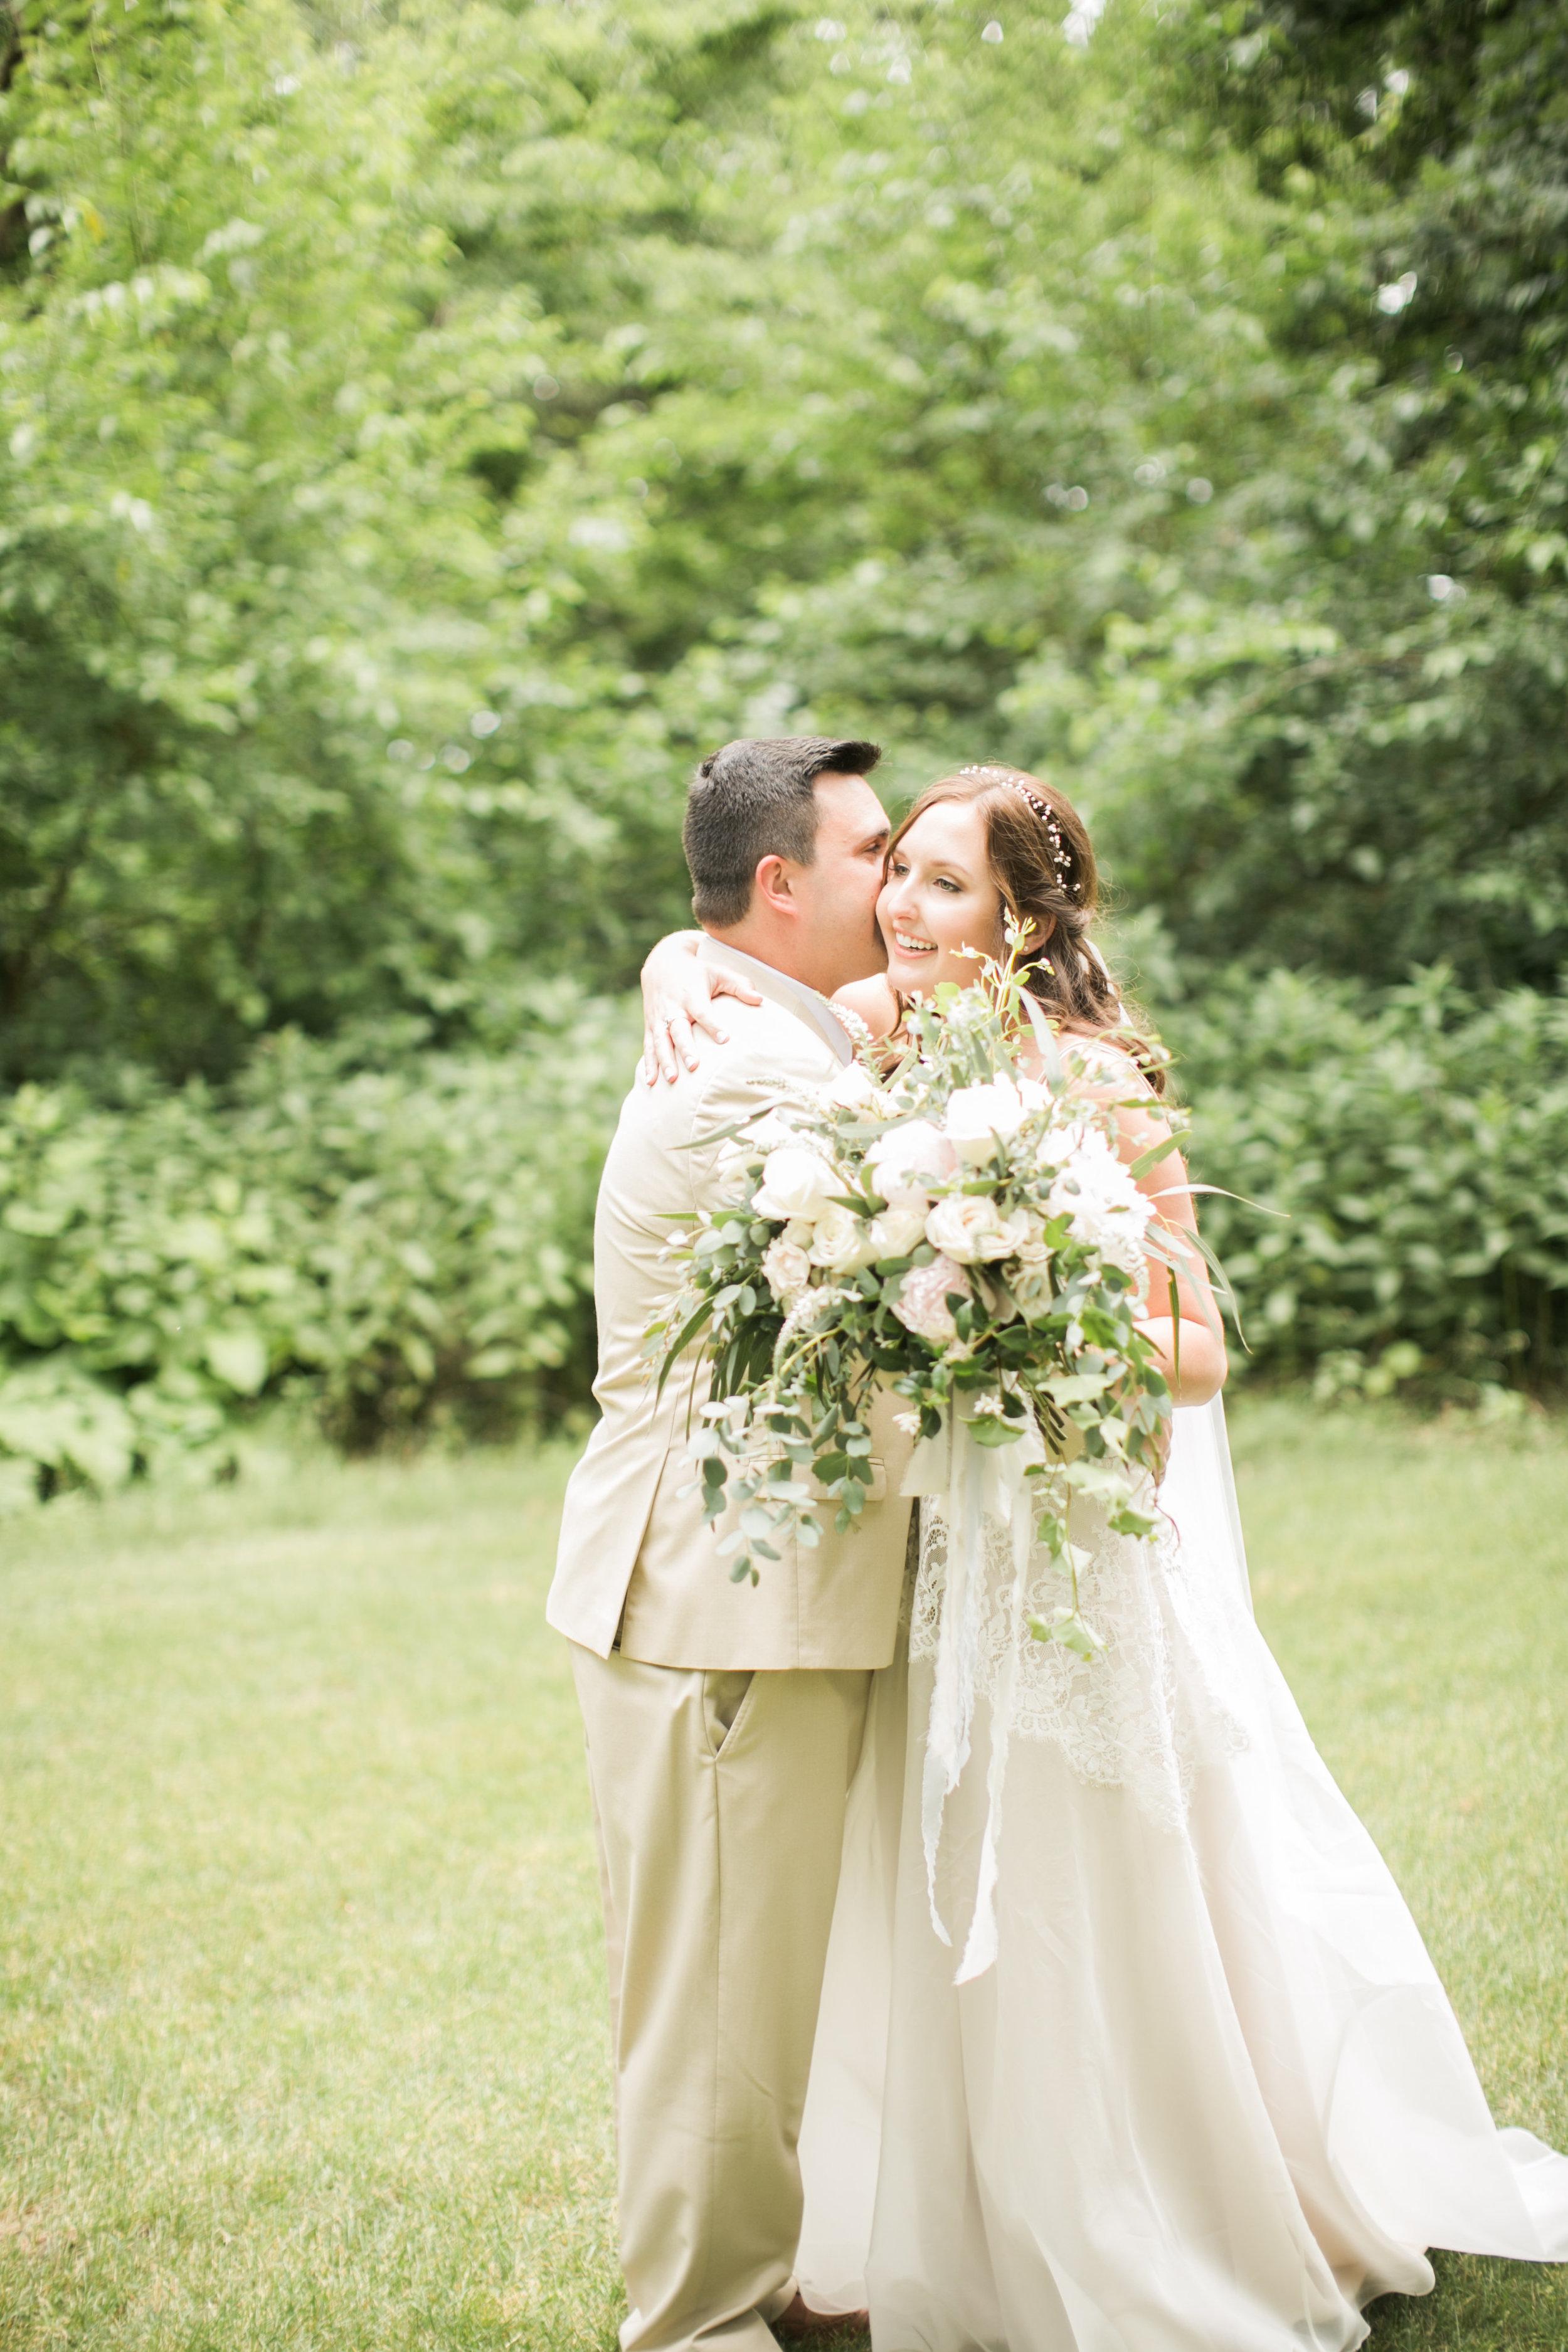 newlyweds-0260.jpg